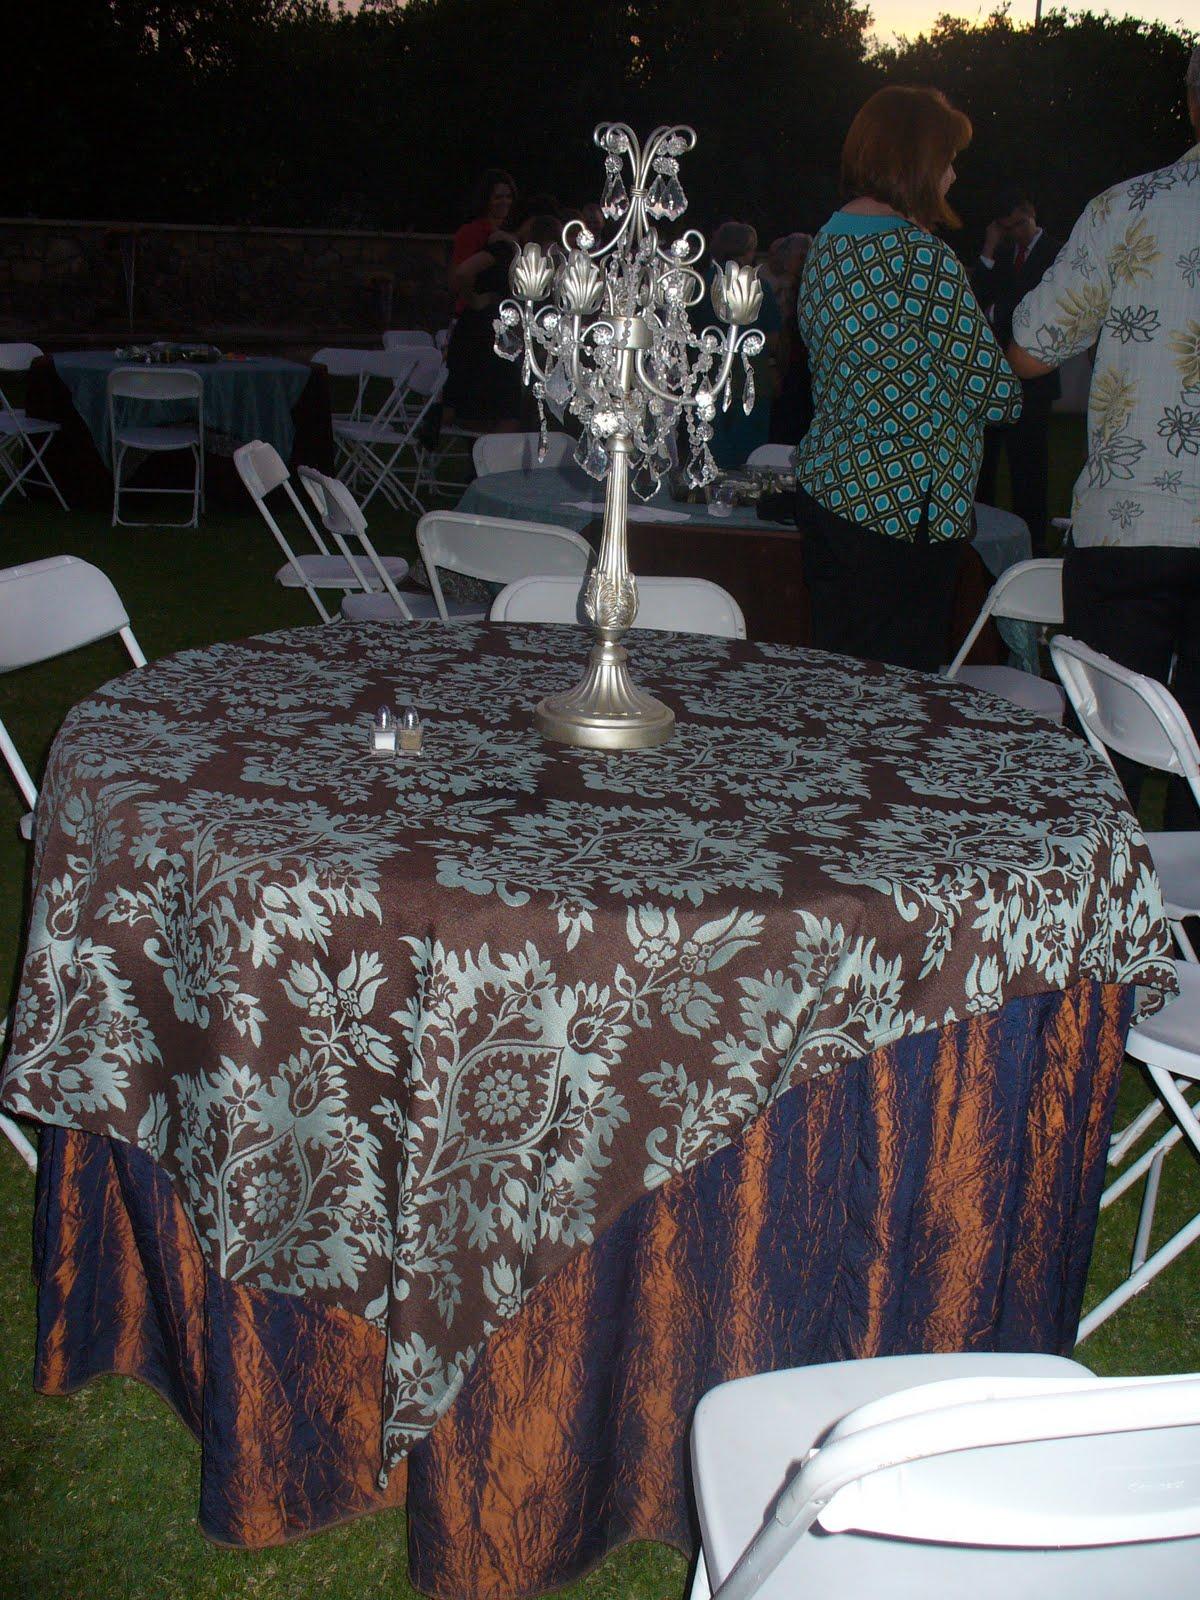 Q&A: unique outdoor fall wedding ideas/reception ideas?